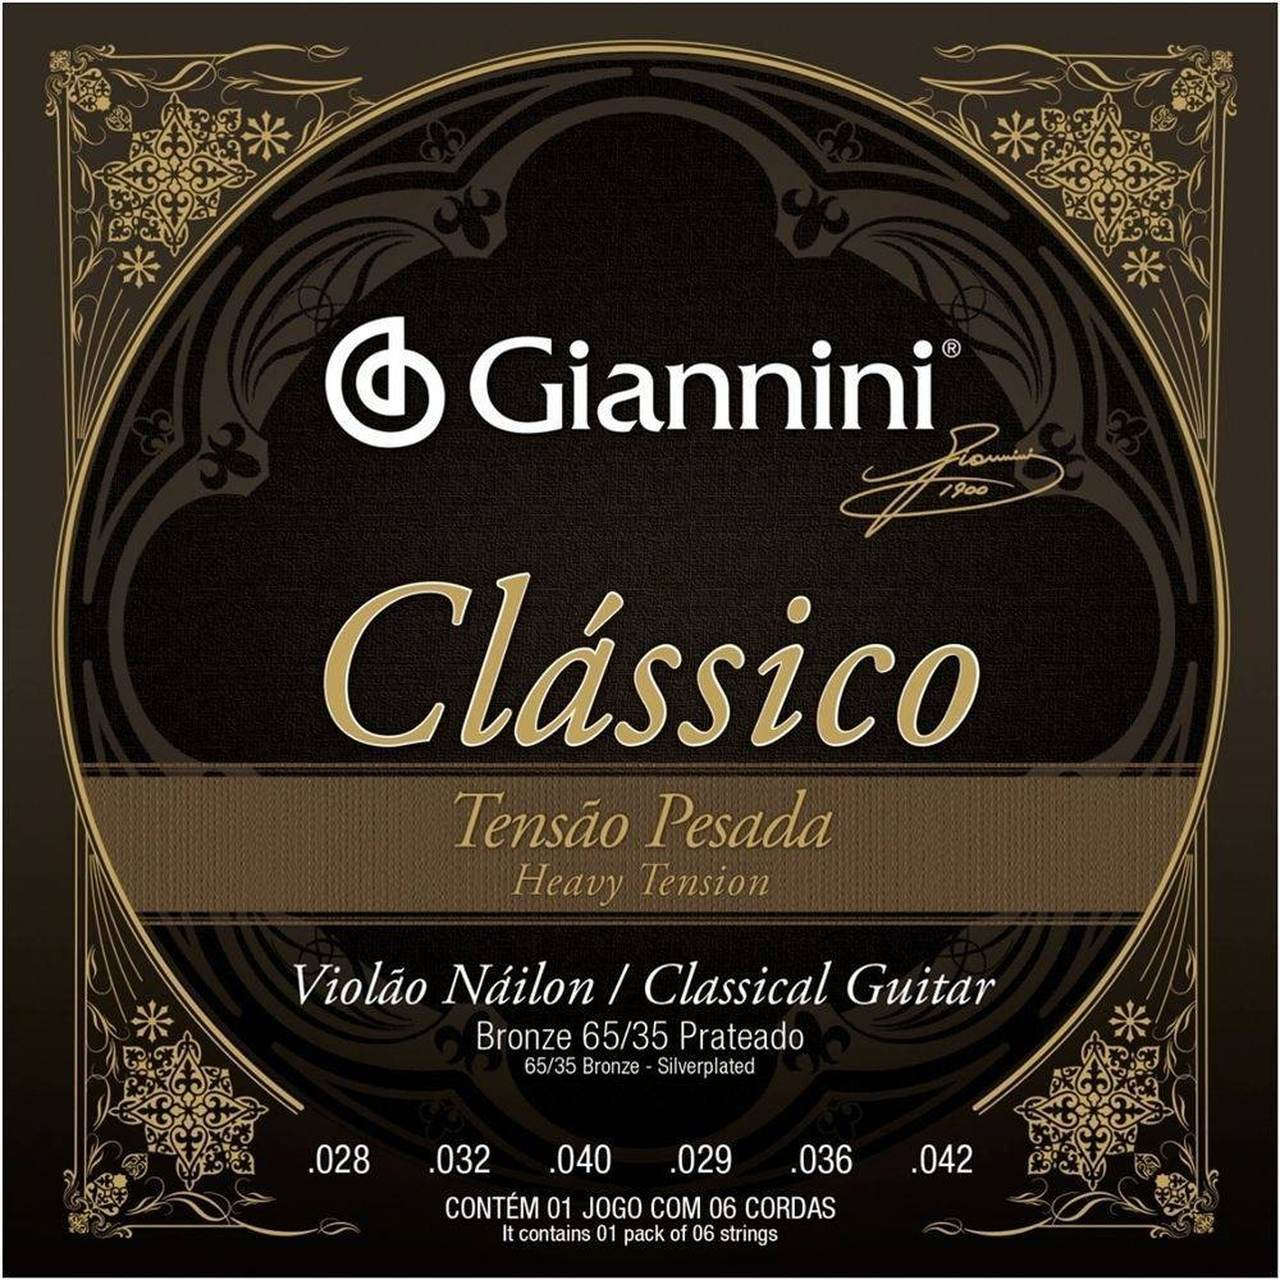 Encordoamento Violão Nylon Giannini GENWPA Tensão Pesada